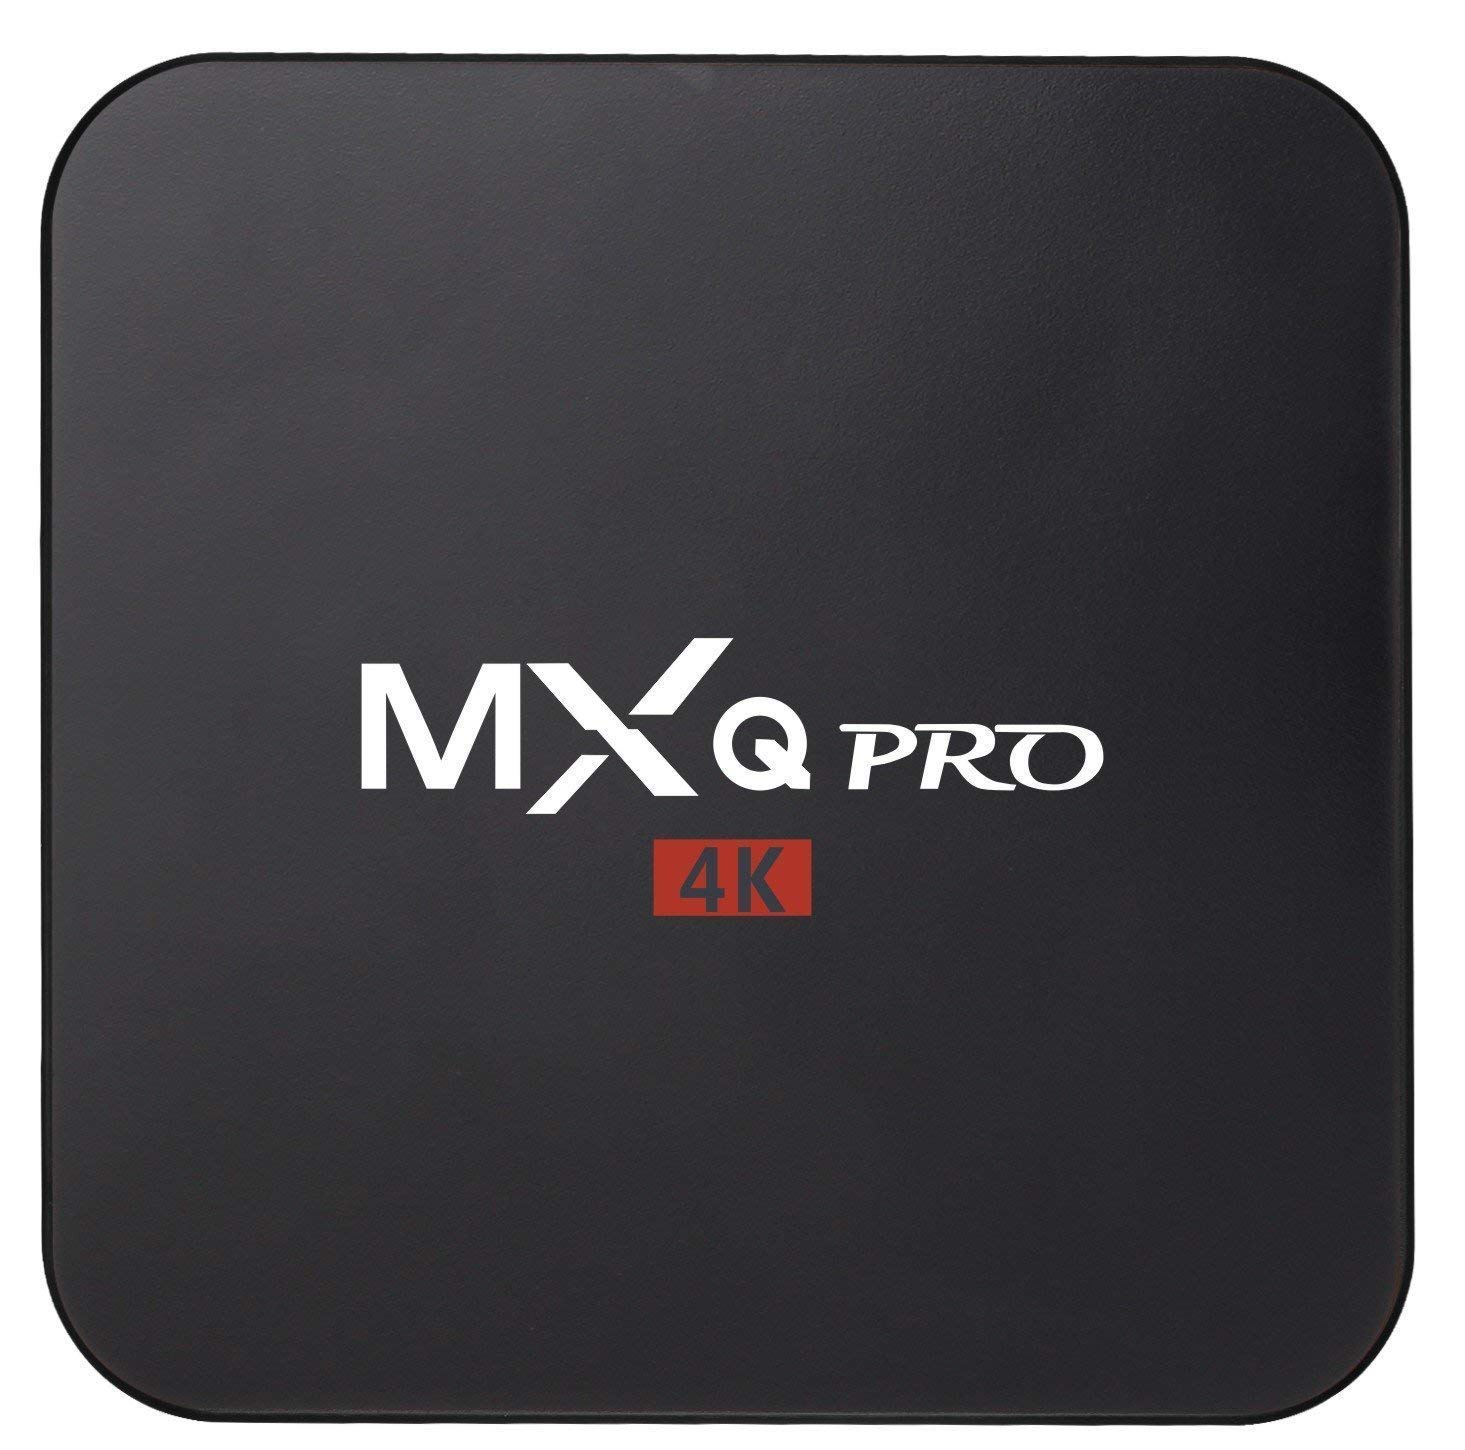 MXQ Pro 4K Android 7.1 TV Box S905X Quard-core 1G+8G Wi-Fi Embedded UHD 4K H.264 Media Center Smart OTT TV Box by Aimpire